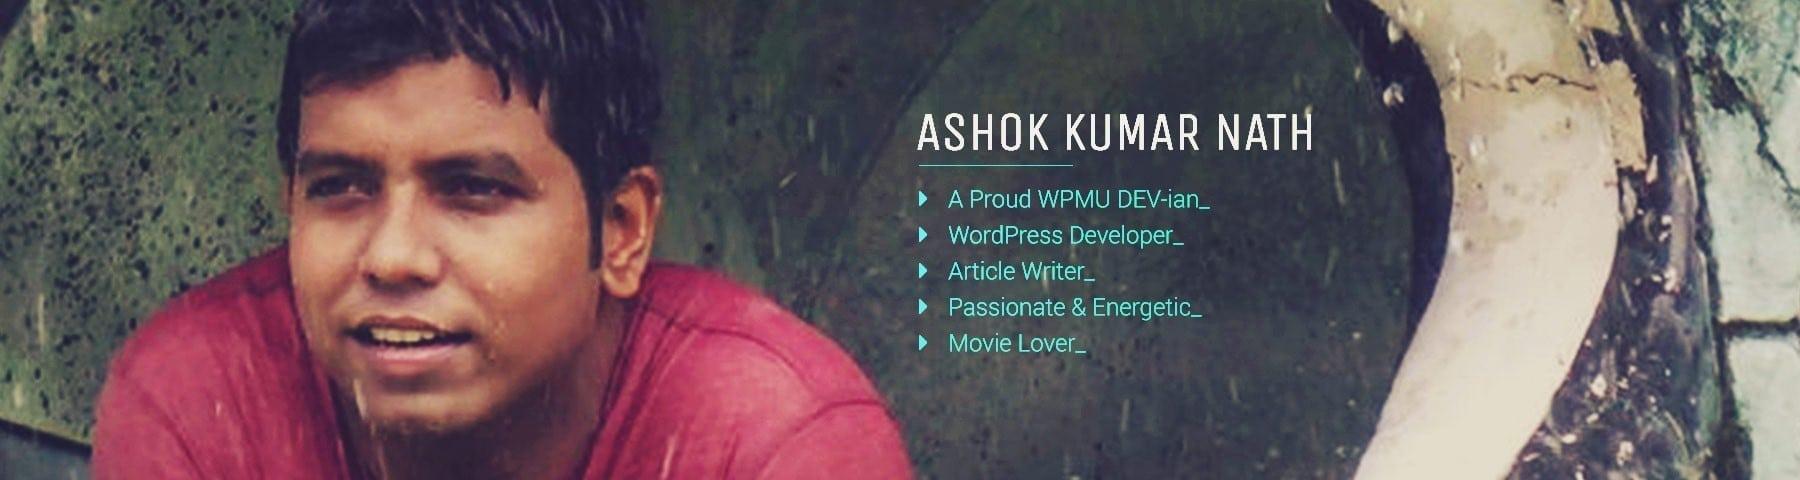 Ashok Kumar Nath | Bappi D Great